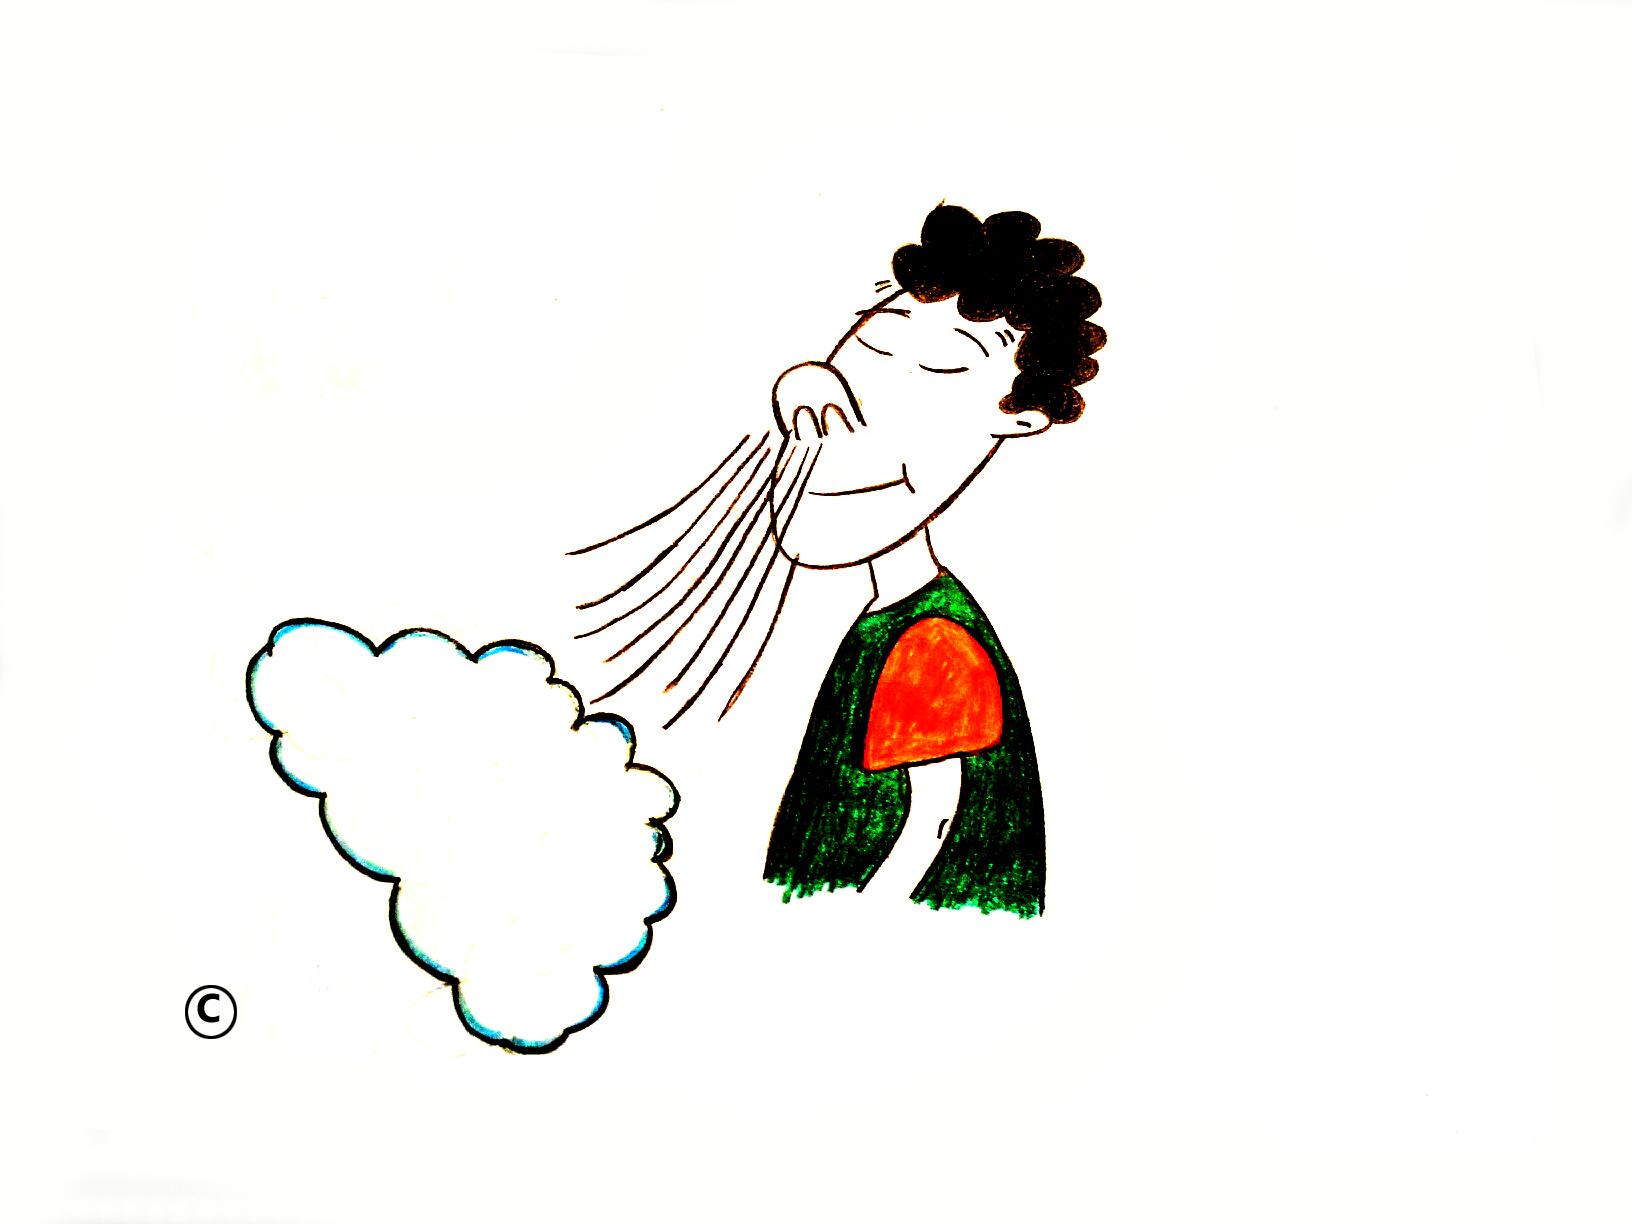 Breathing Air Clipart.